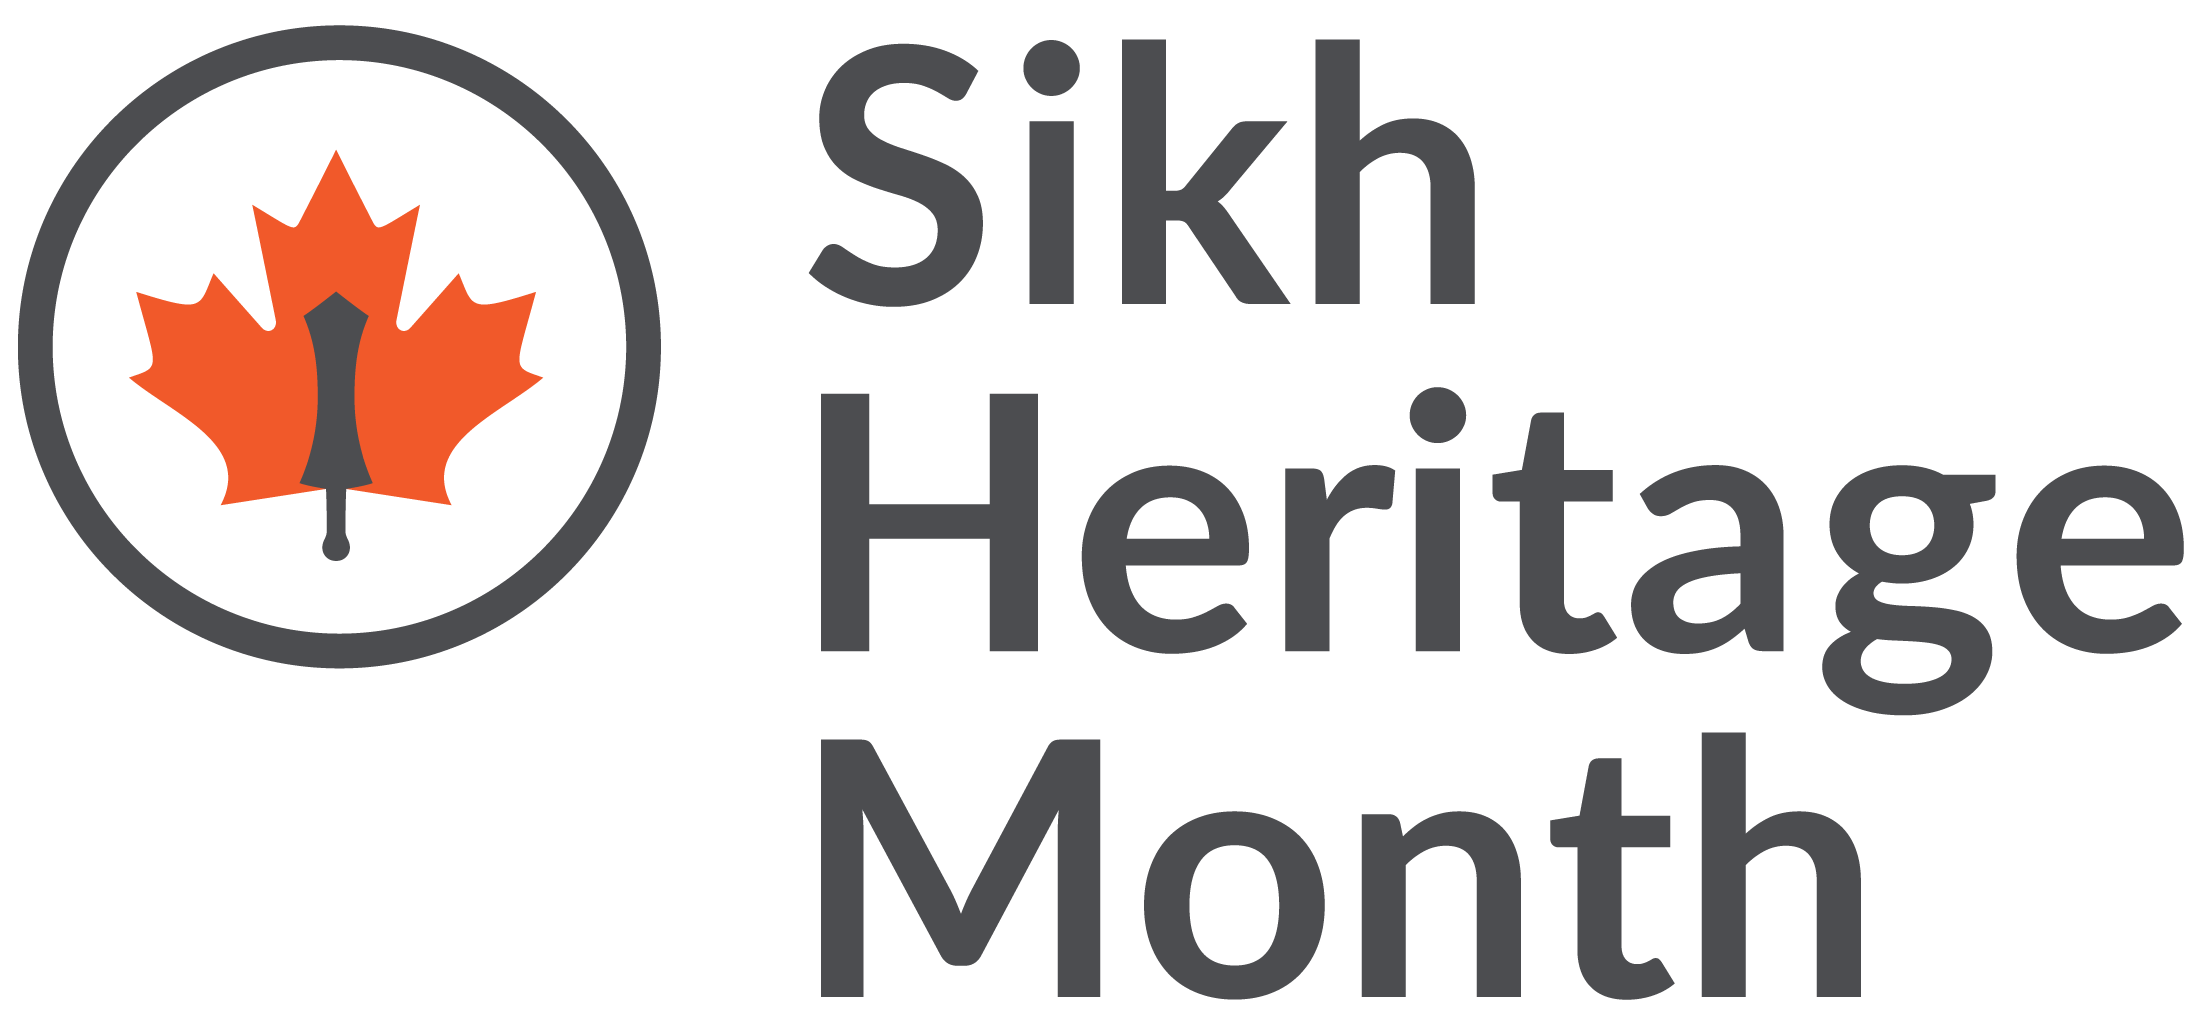 Sikh Heritage Month - April